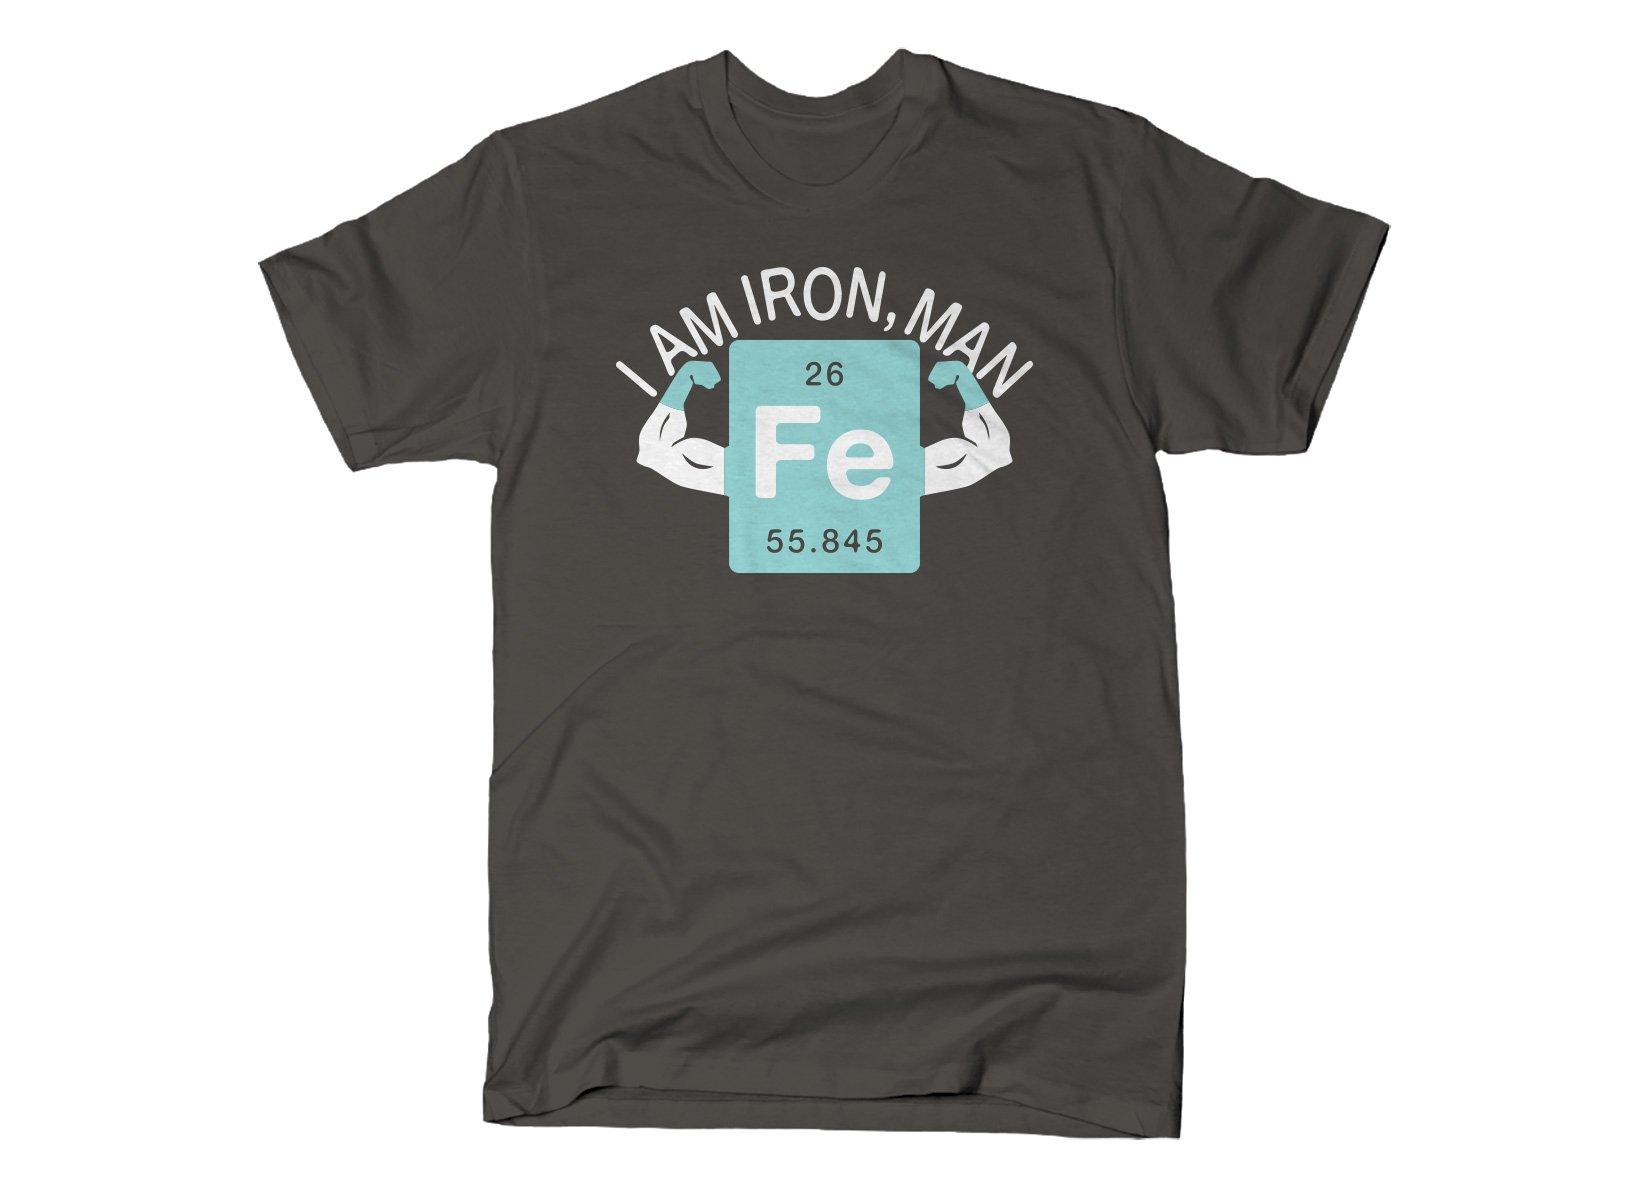 953d3248 I Am Iron, Man T-Shirt   SnorgTees